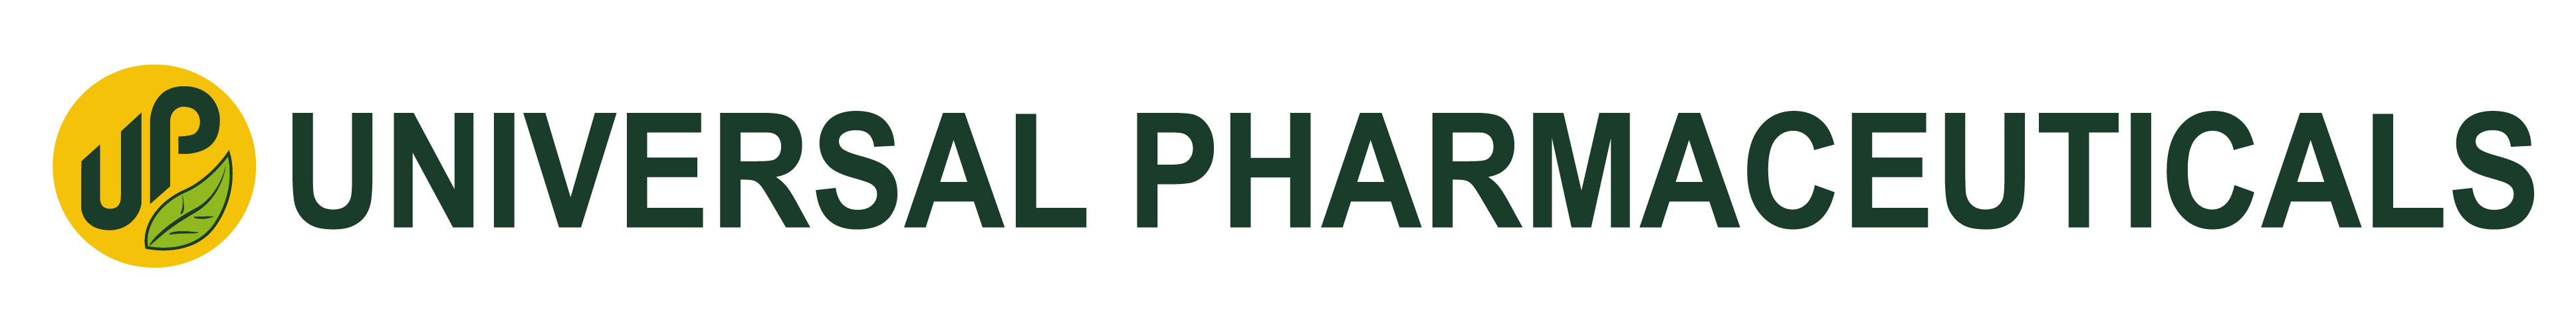 Universal pharmaceuticals